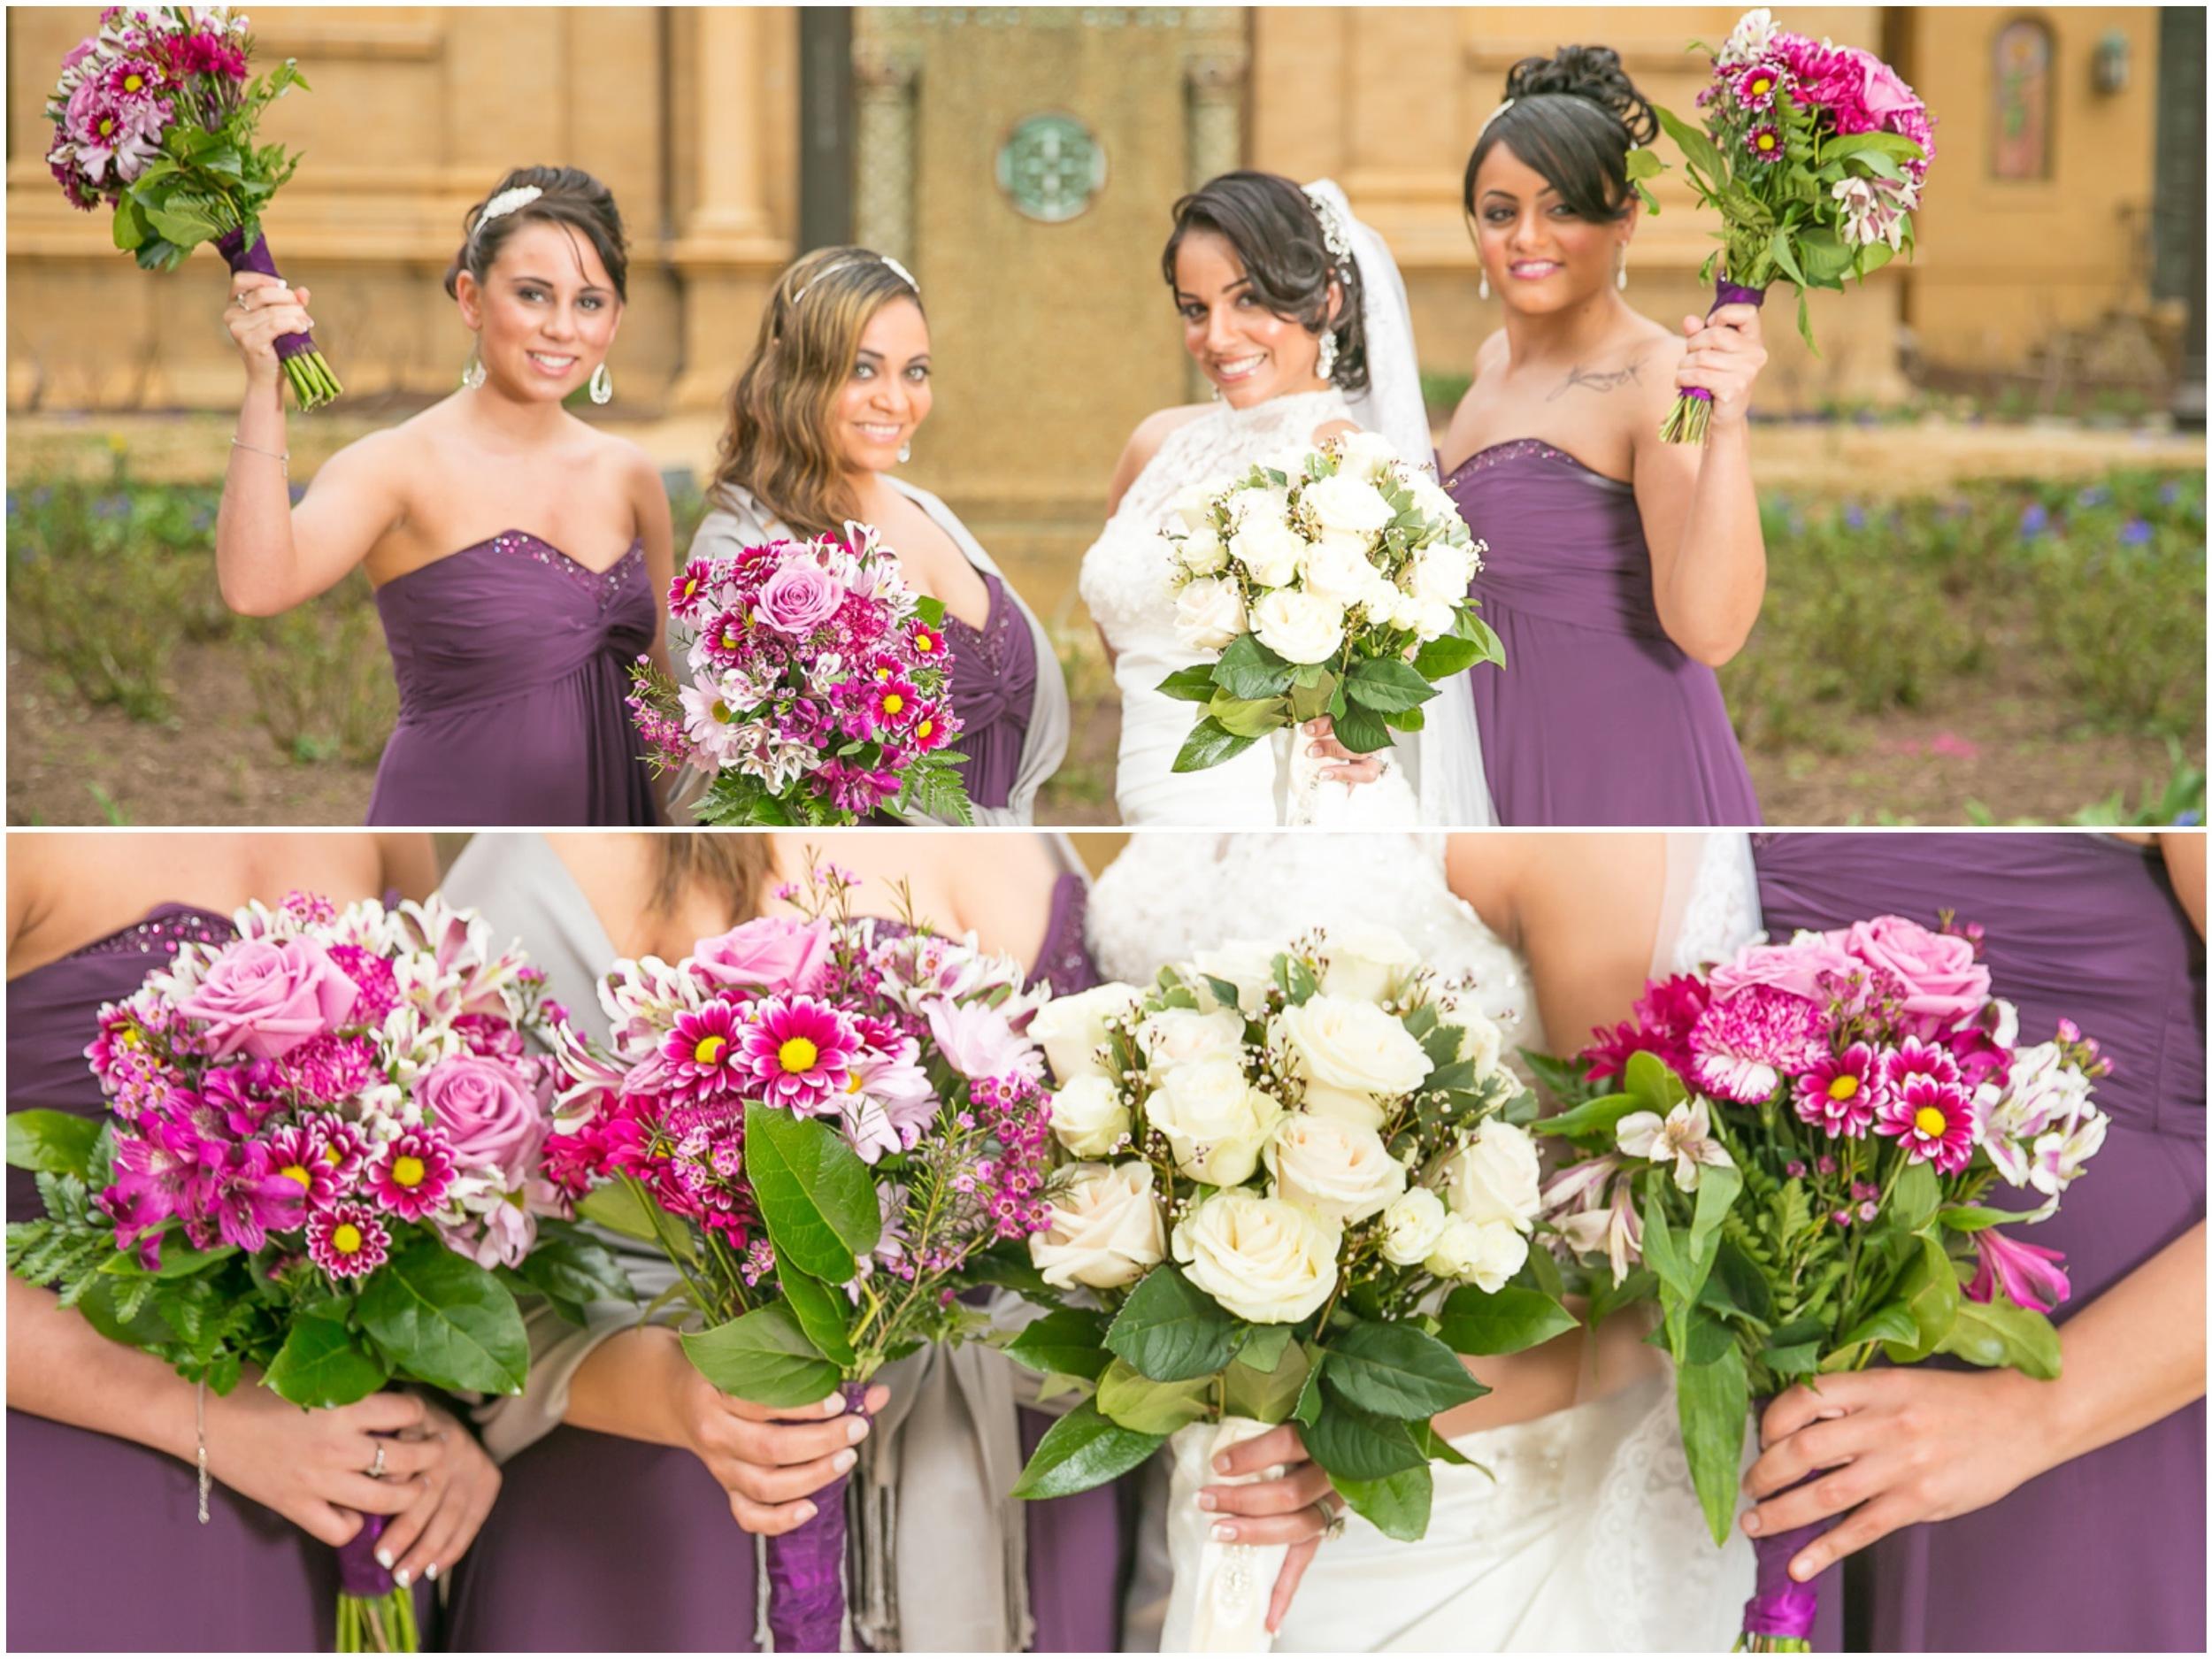 Bradly-and-Jesenia-Wedding-Collage-26.jpg